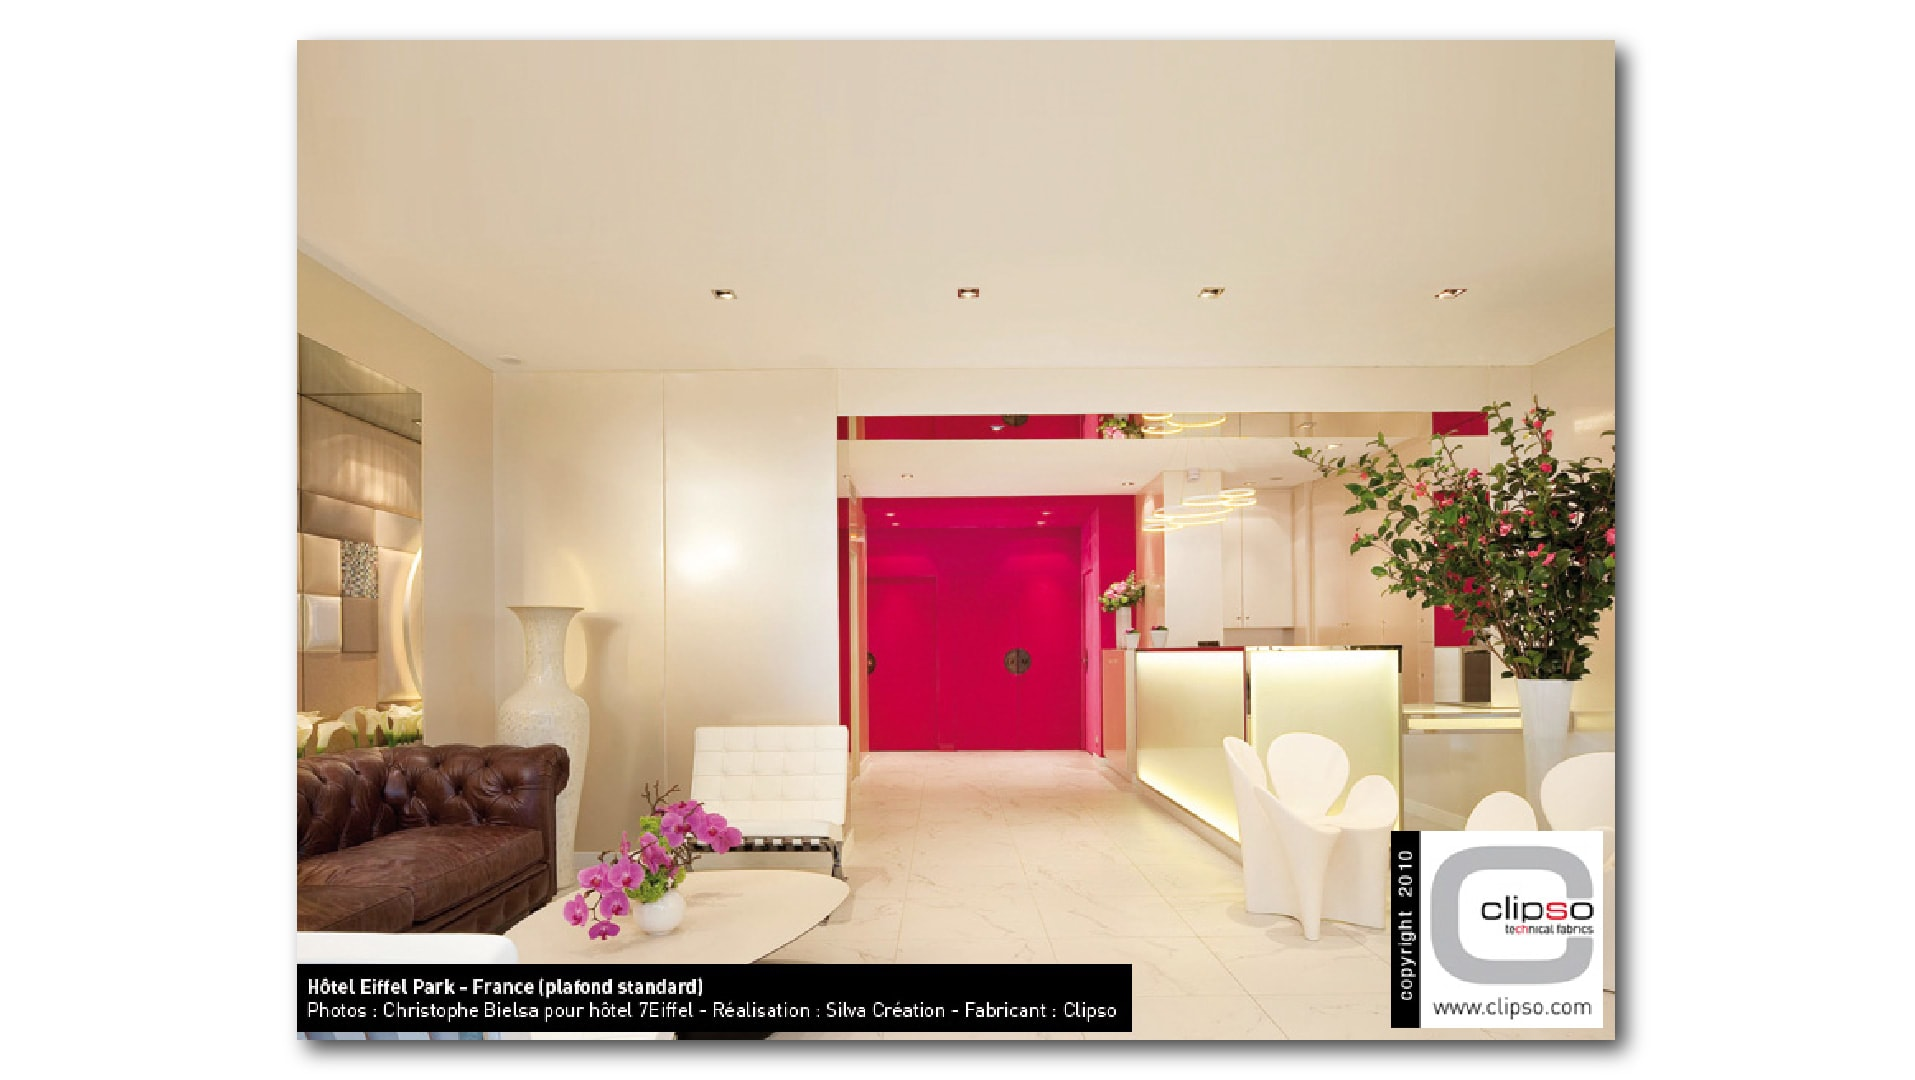 Hotelzimmer_mit_Clipso-Standard-01_msfj6c